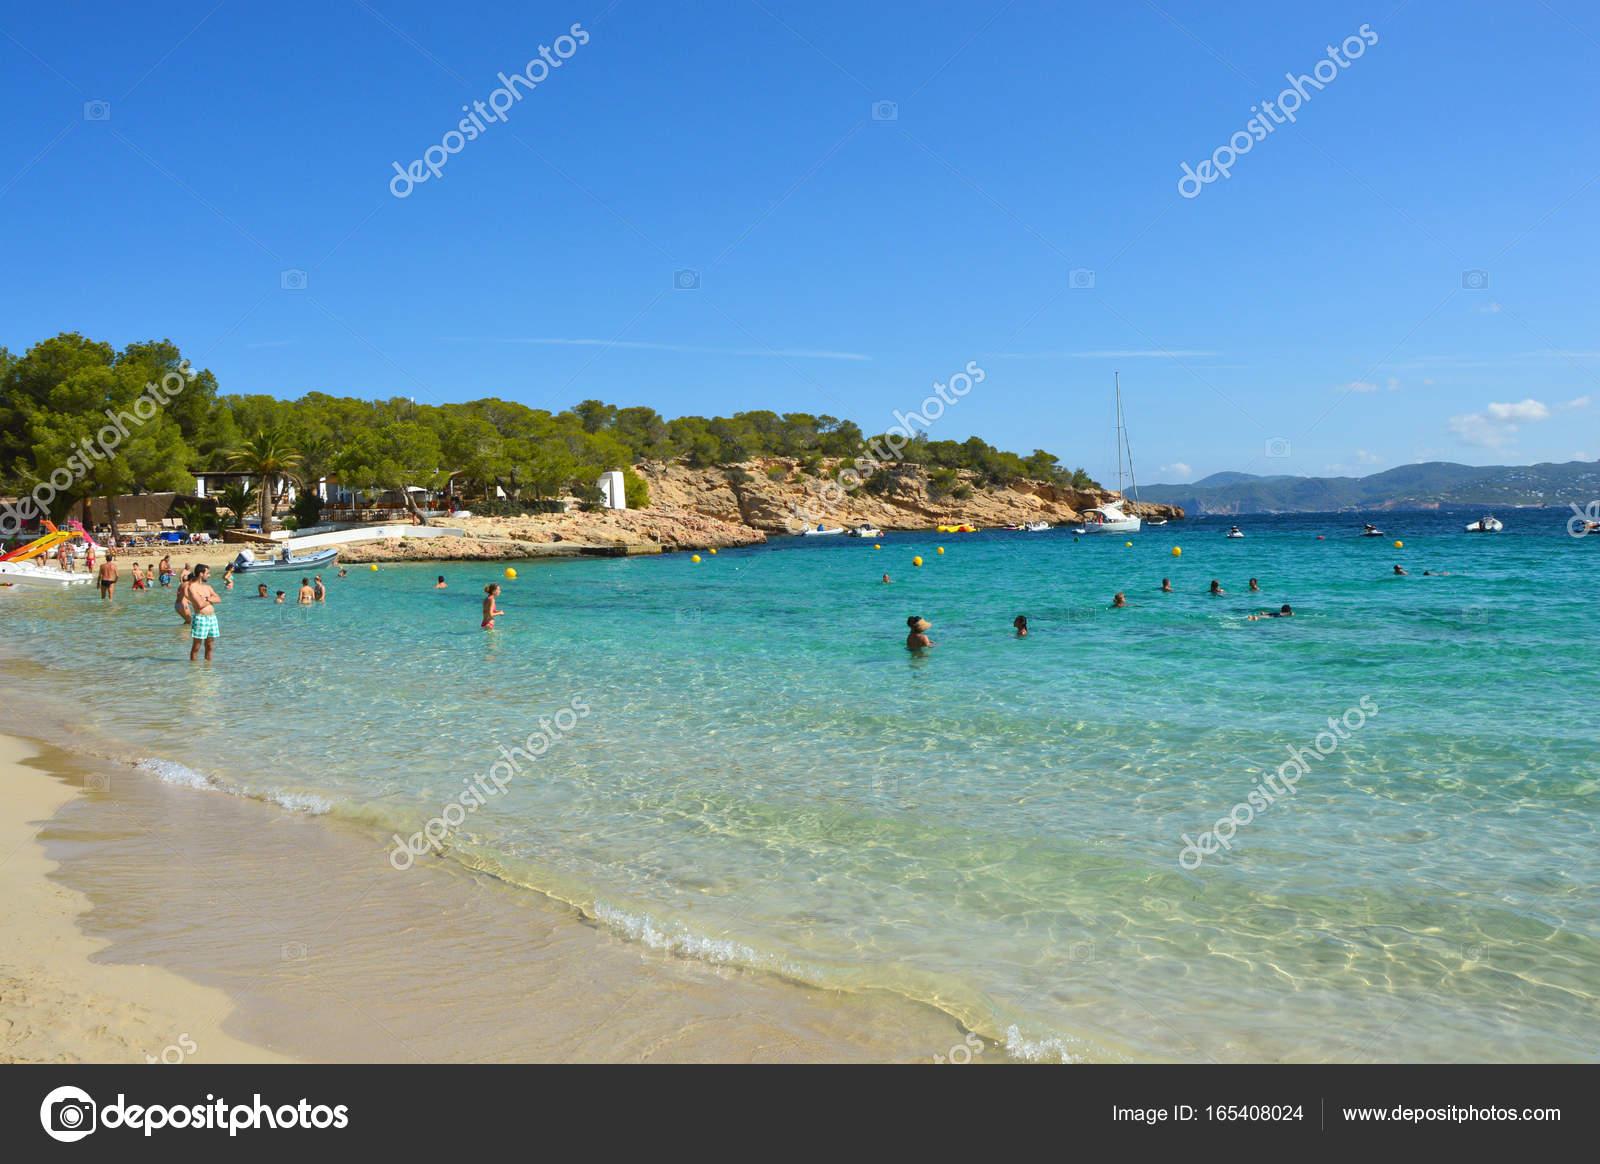 Amazing crystalline water of Cala Bassa beach, Ibiza, Spain